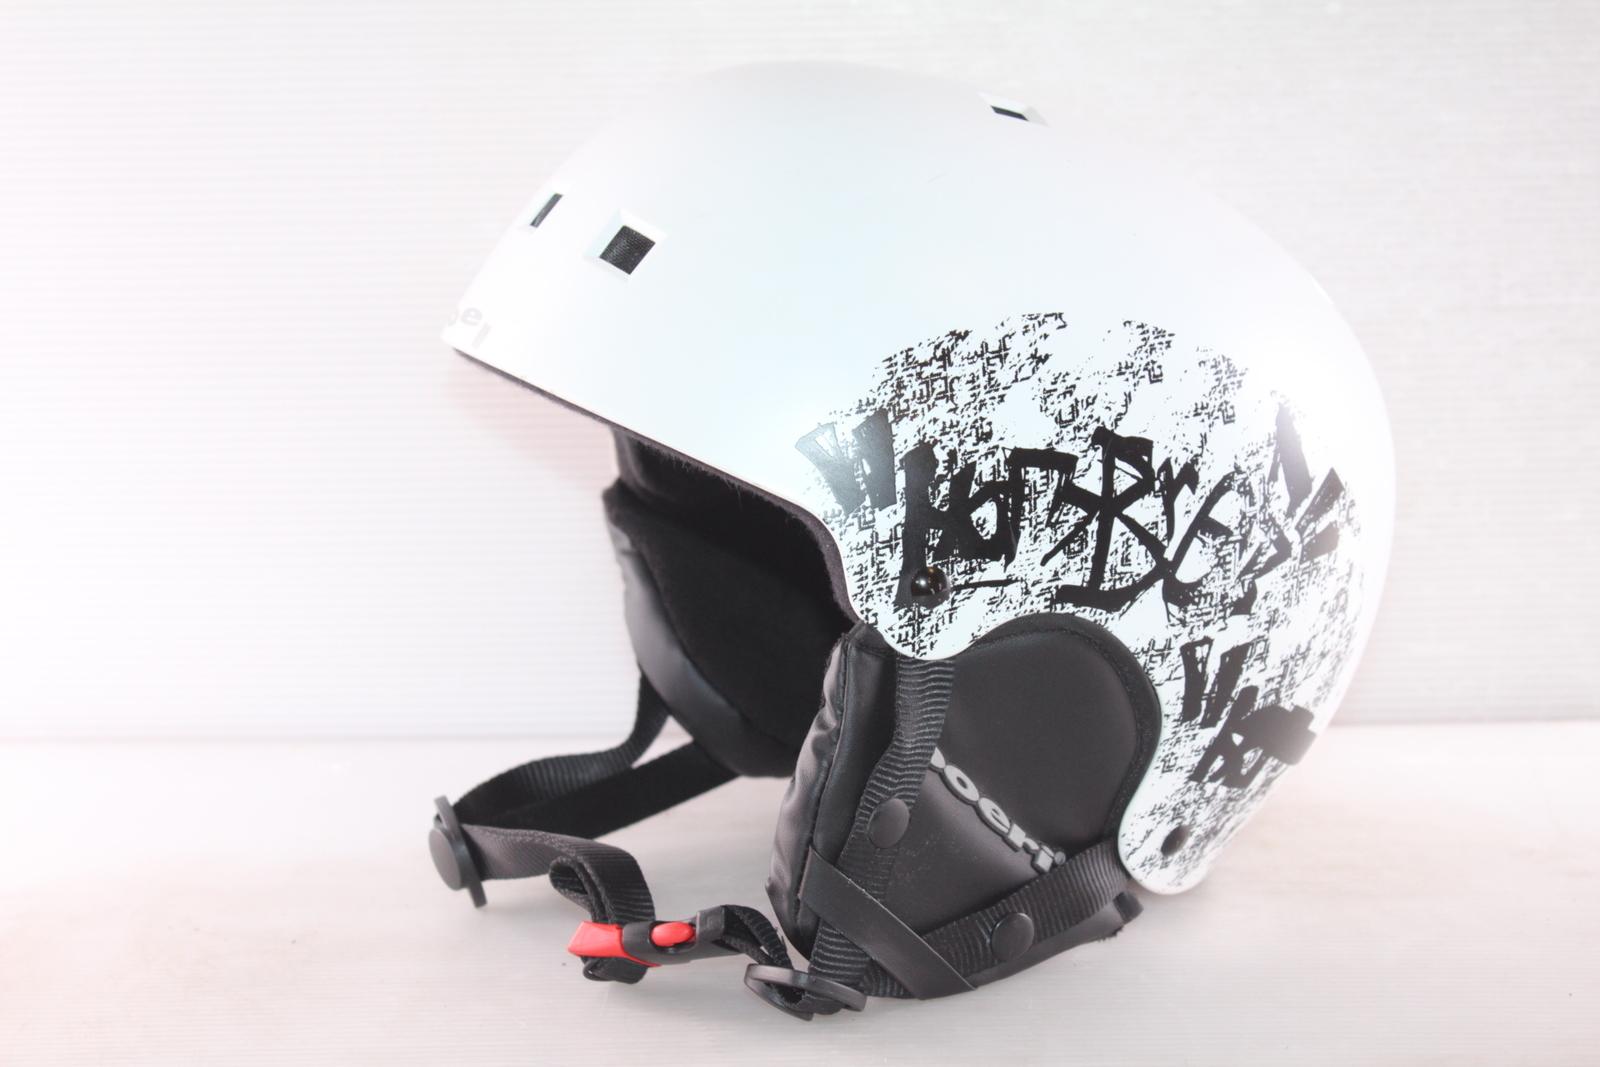 Dětská lyžařská helma Boeri Recco - posuvná vel. 58 - 60